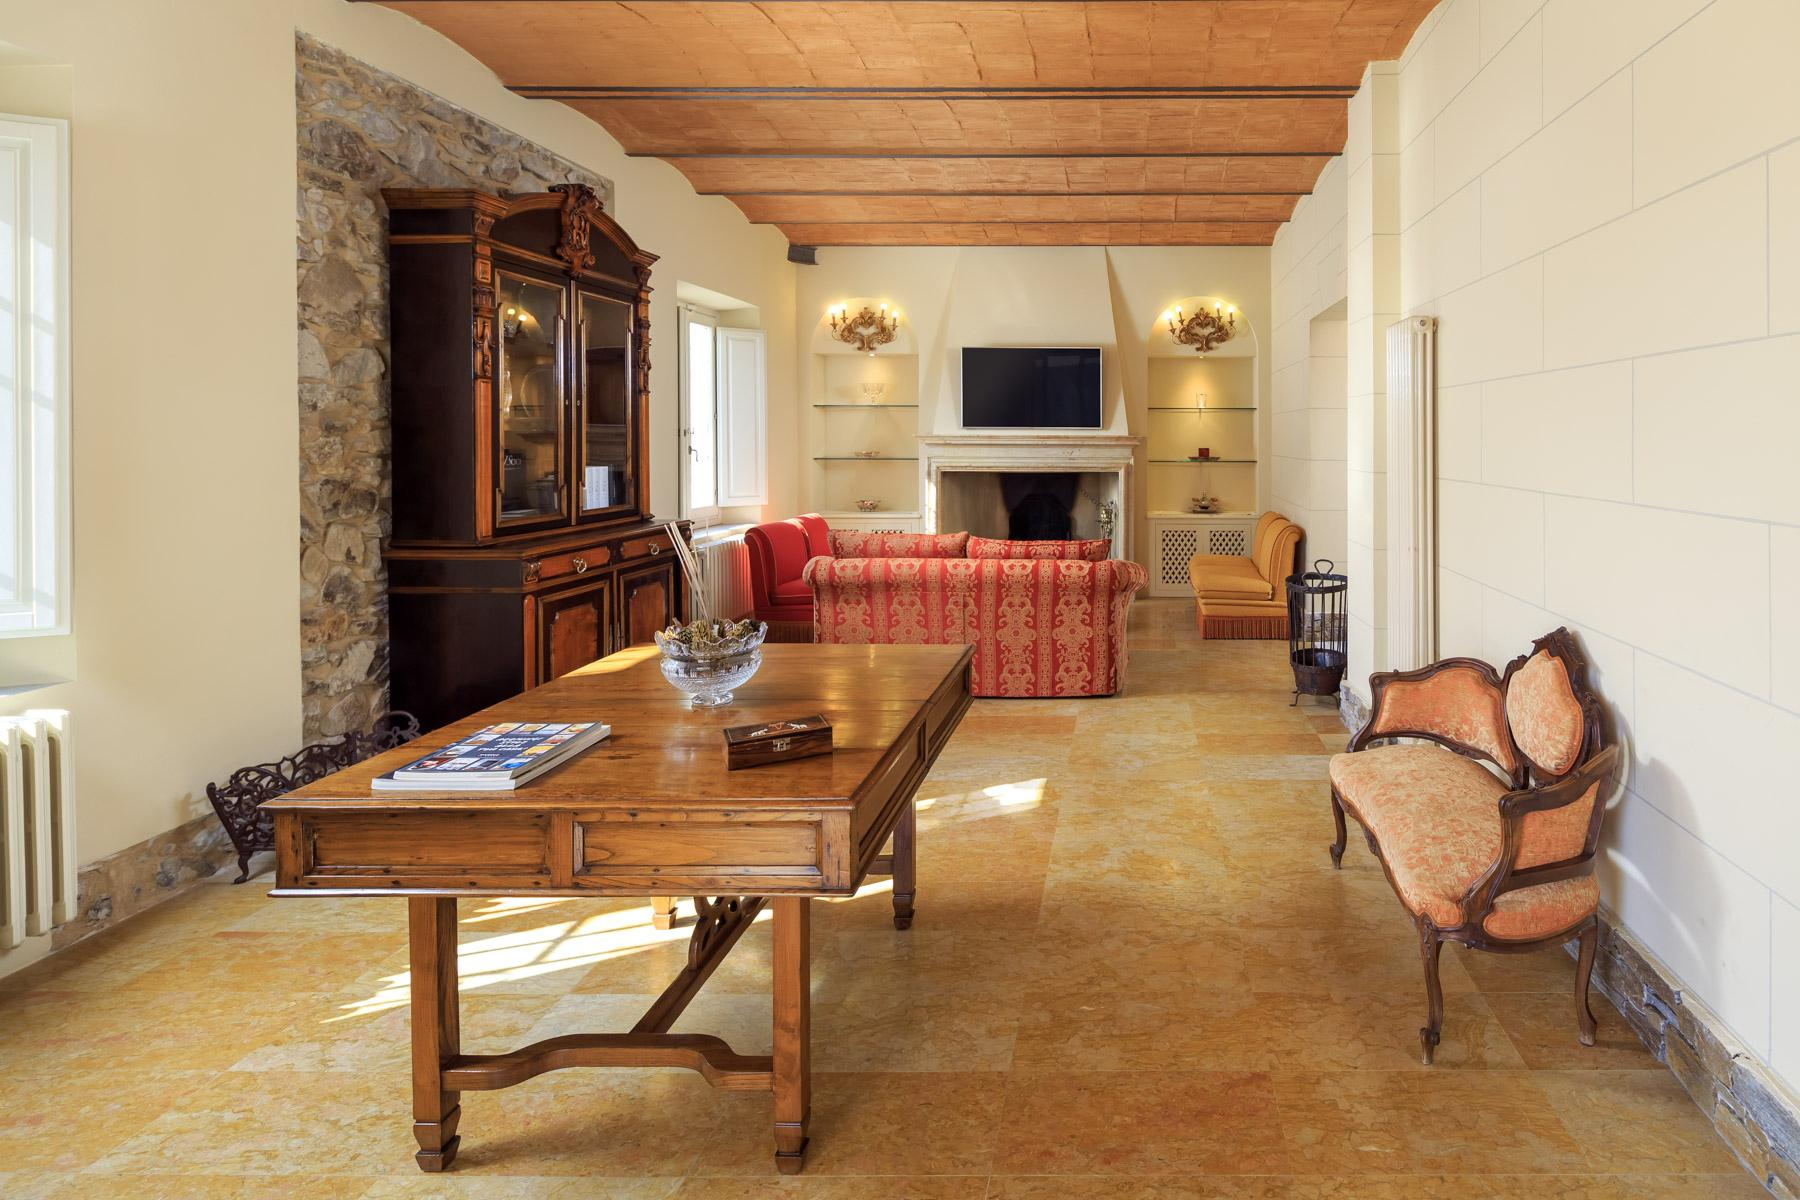 Montecatini Terme小镇优雅的新艺术风格的别墅 - 18